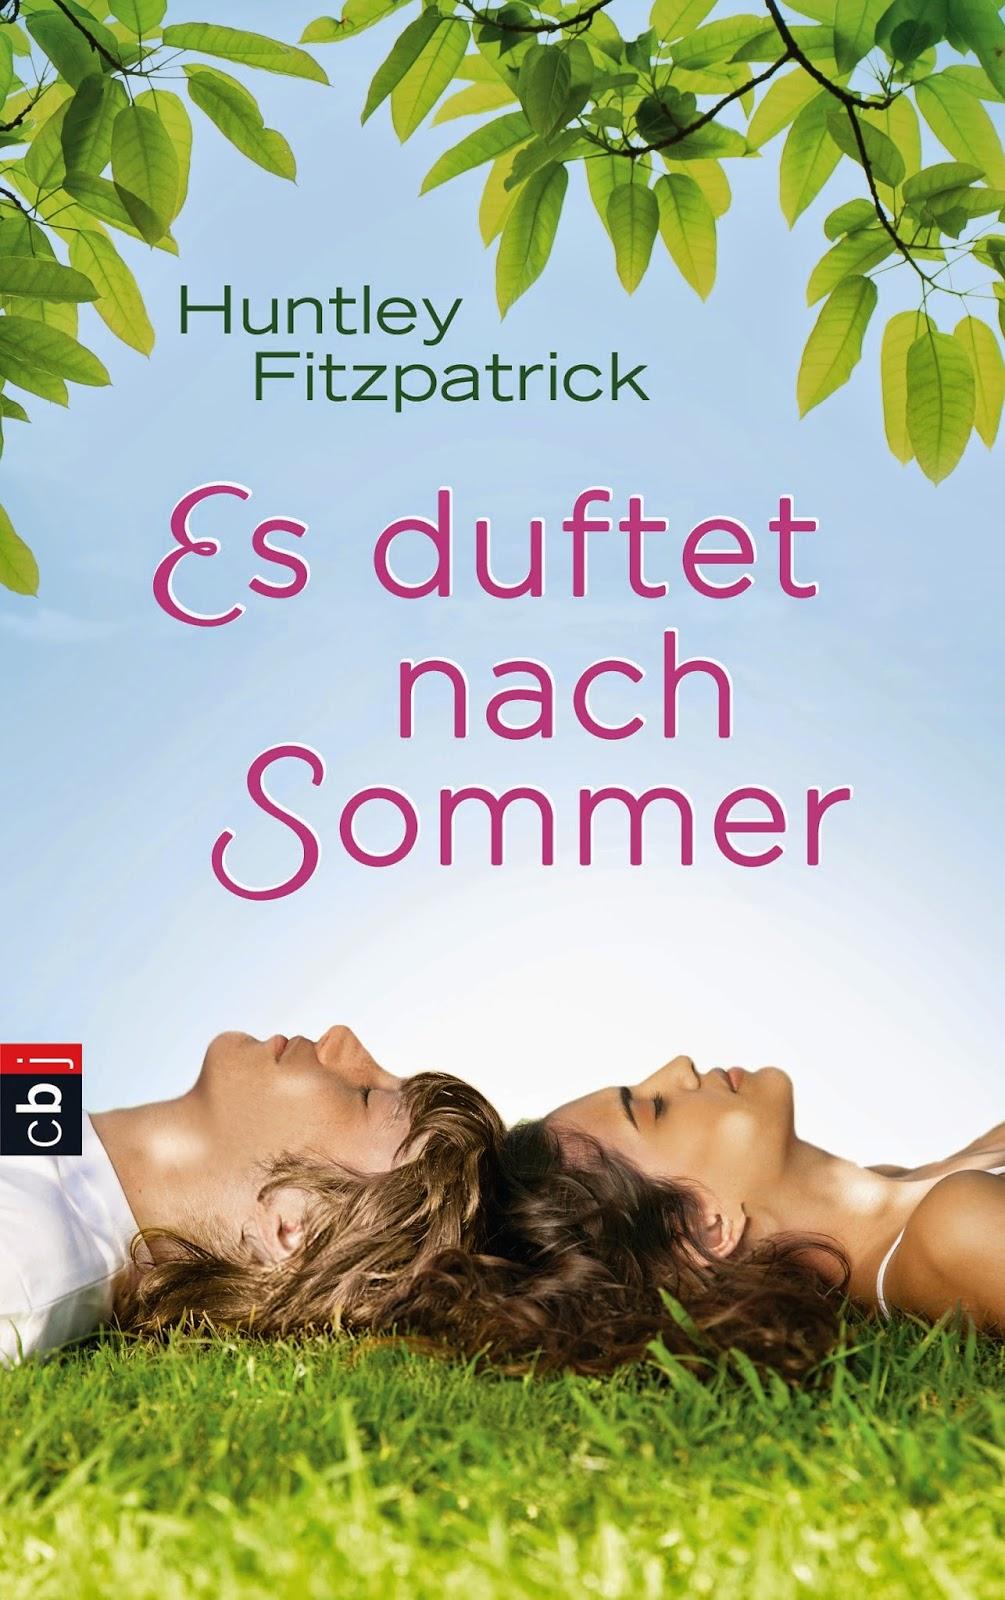 http://www.randomhouse.de/Presse/Buch/Es-duftet-nach-Sommer/Huntley-Fitzpatrick/pr416274.rhd?pub=13000&men=758&mid=5